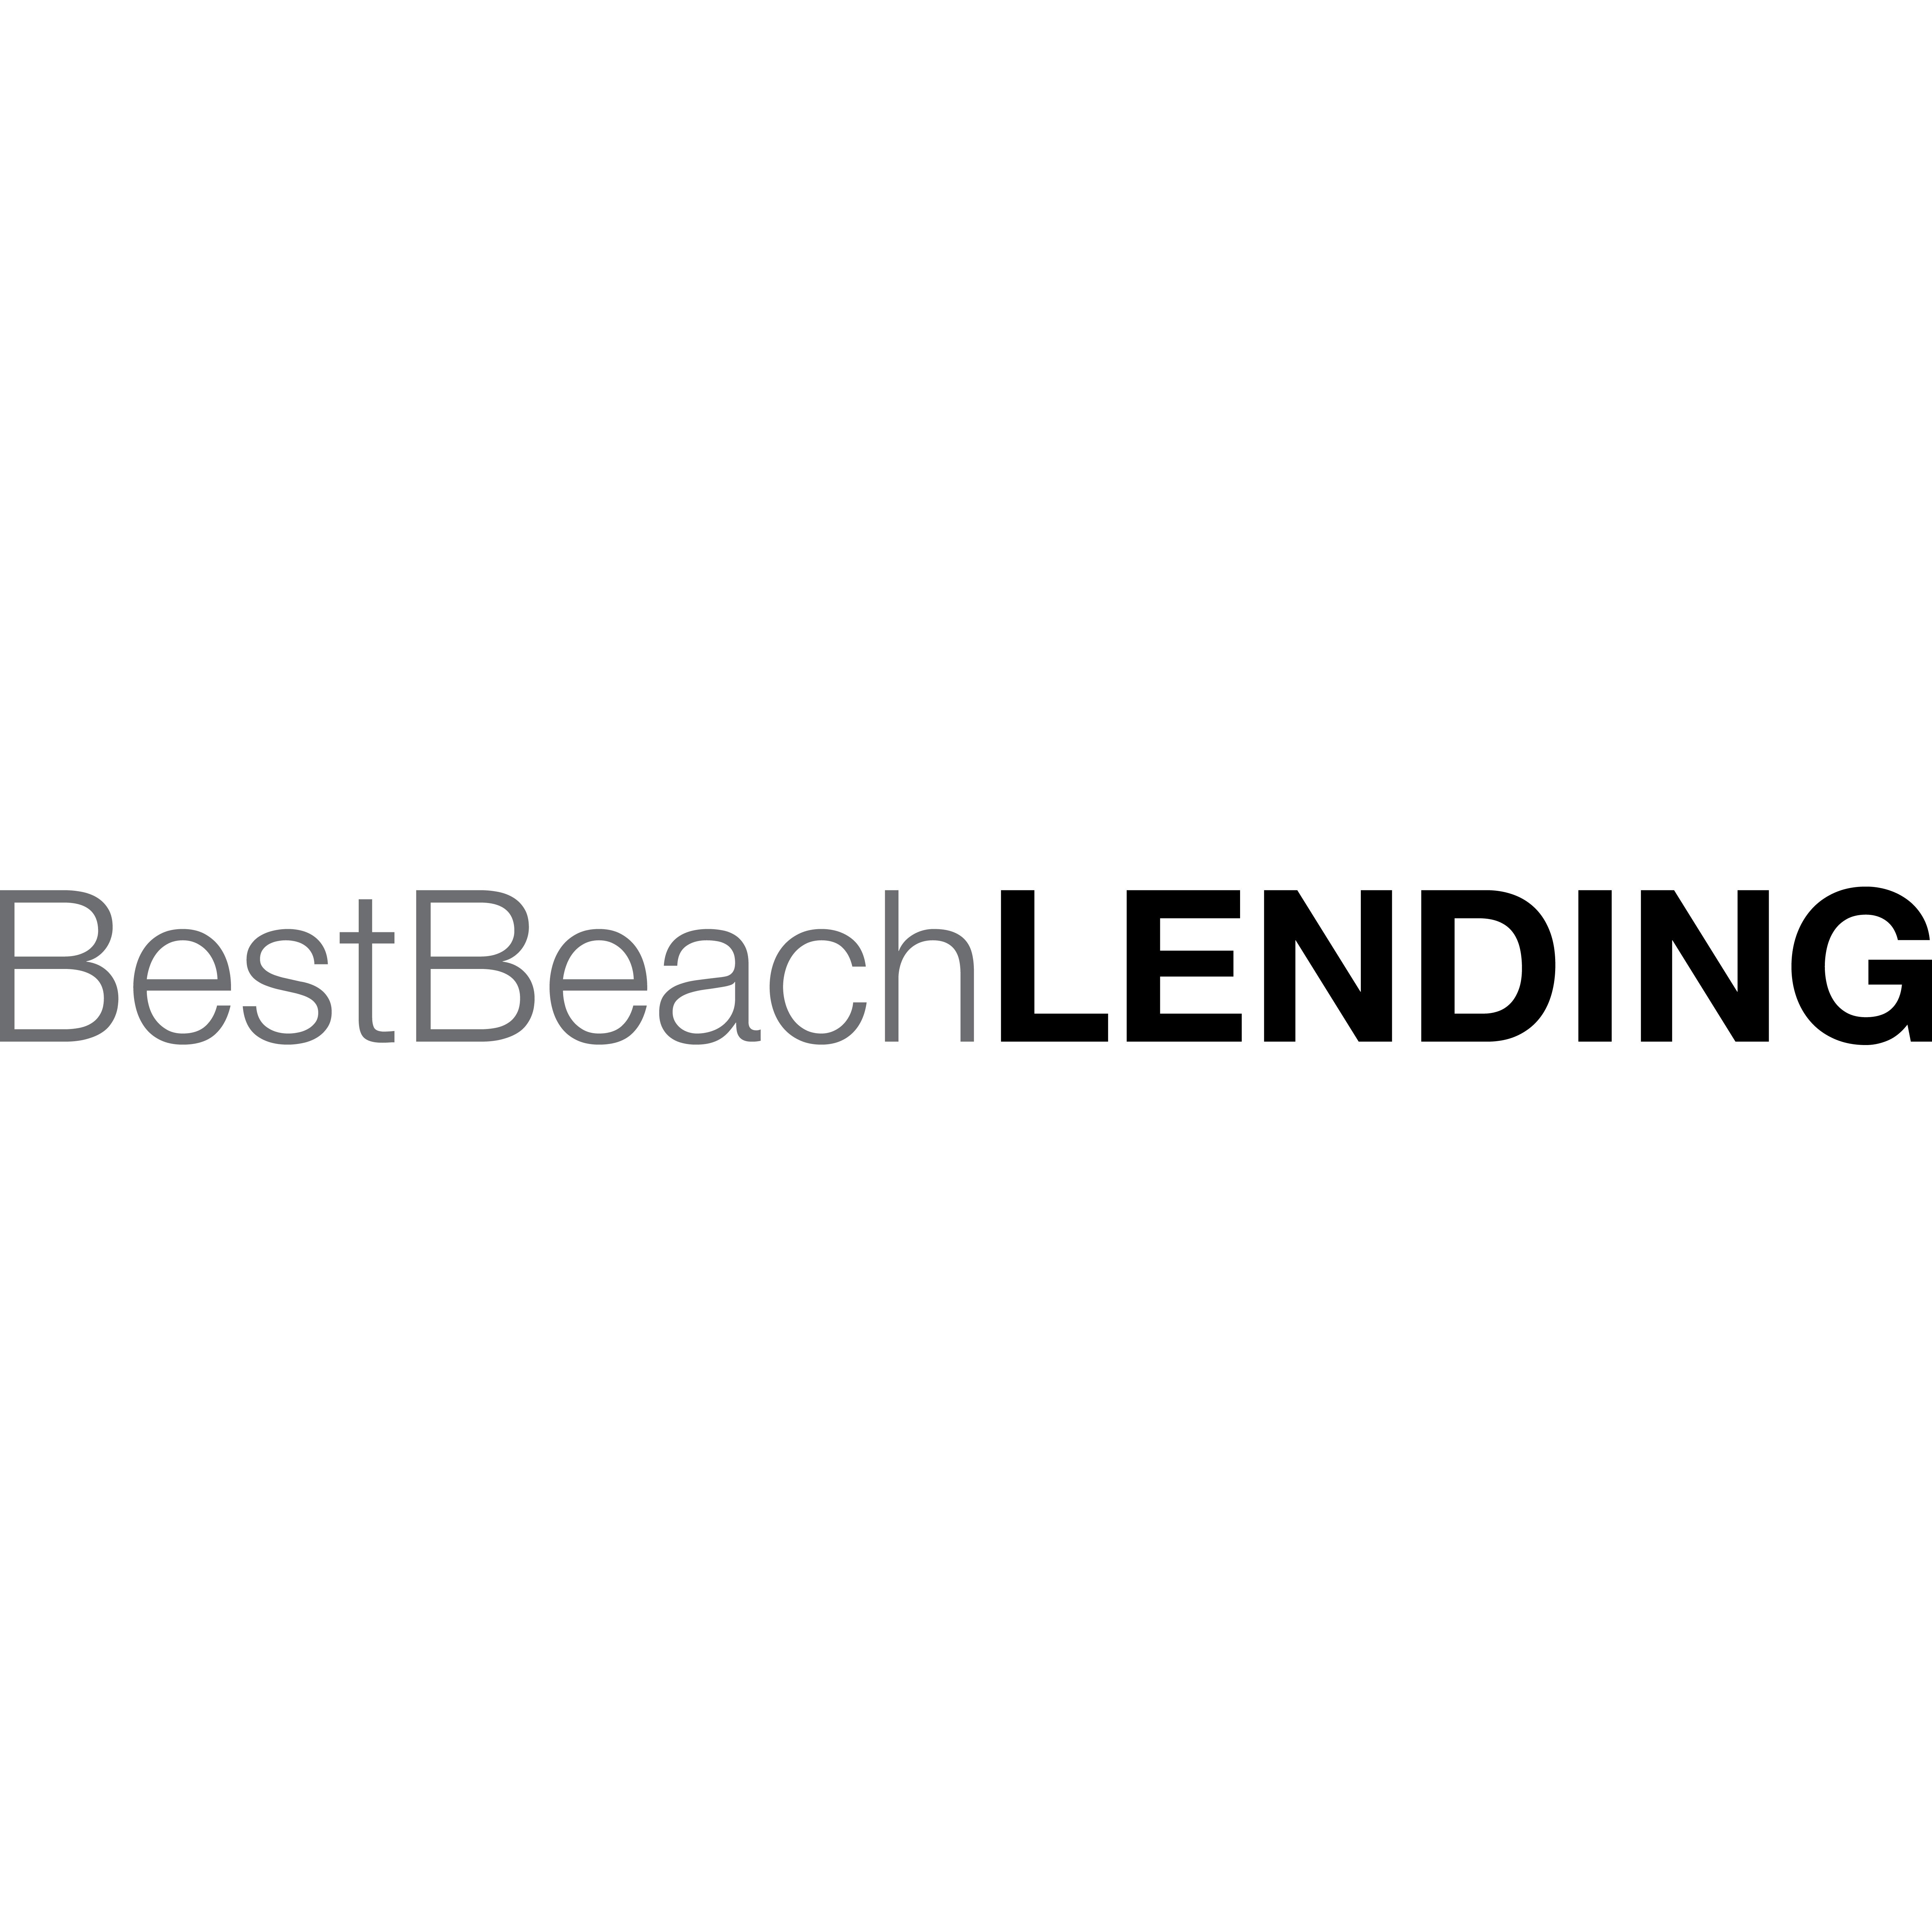 Apolonia San Martin - Best Beach Lending